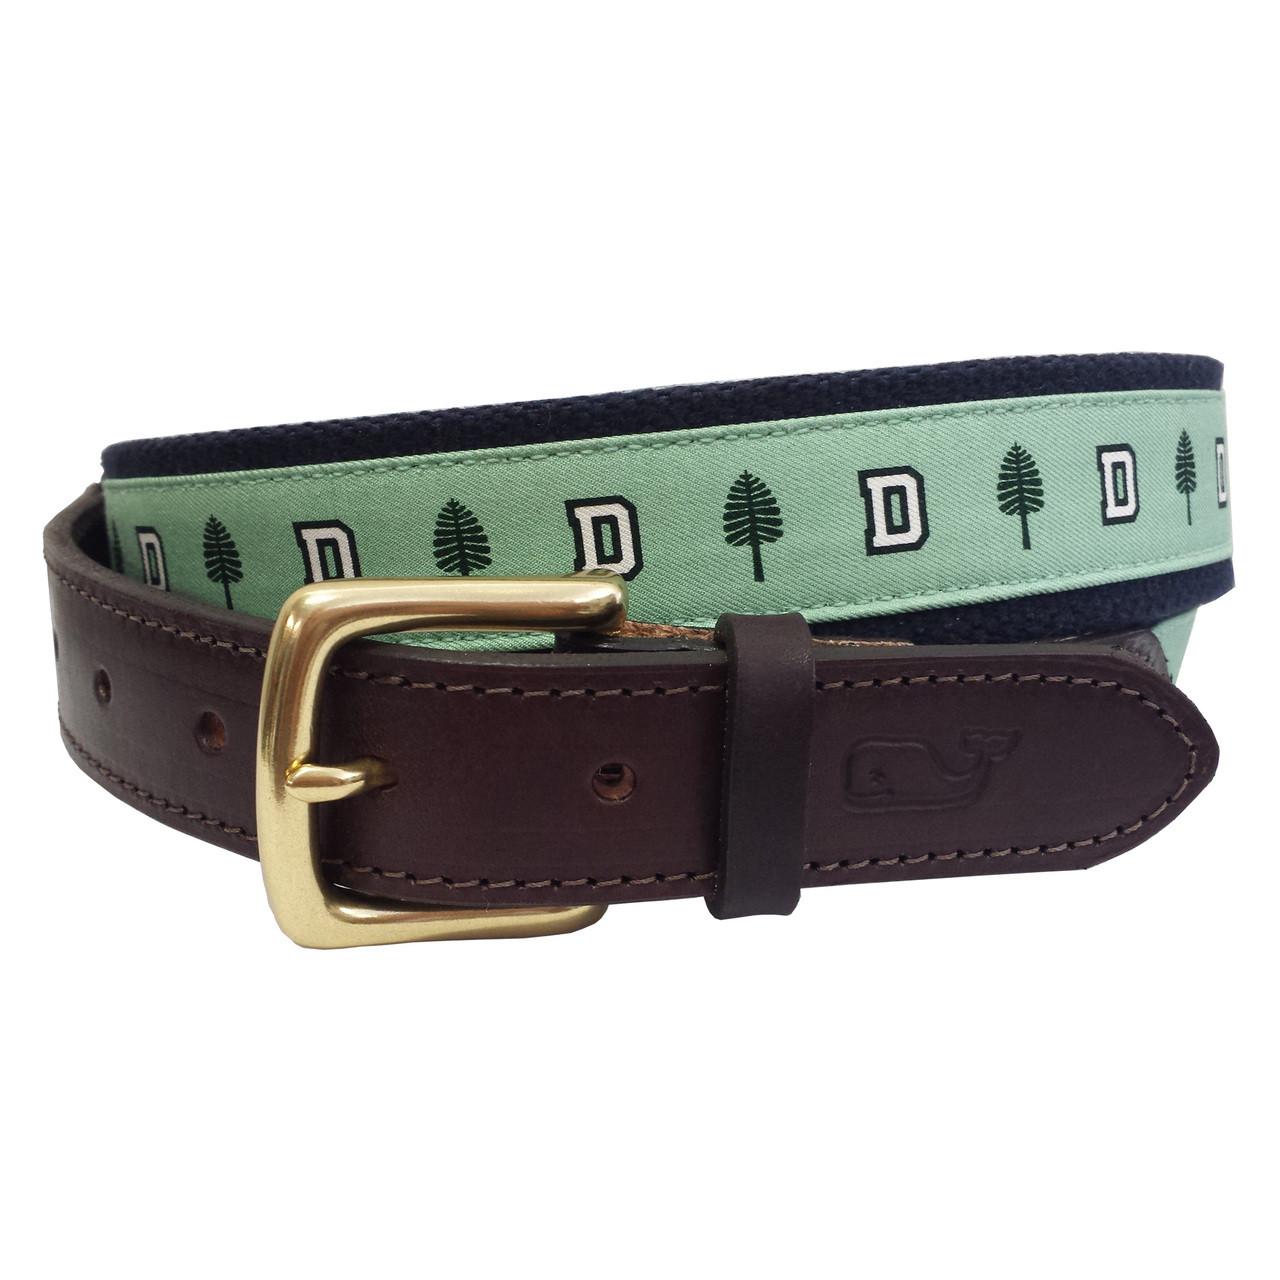 da689d35073f Dartmouth belt, Belts with Dartmouth College logo, Dartmouth